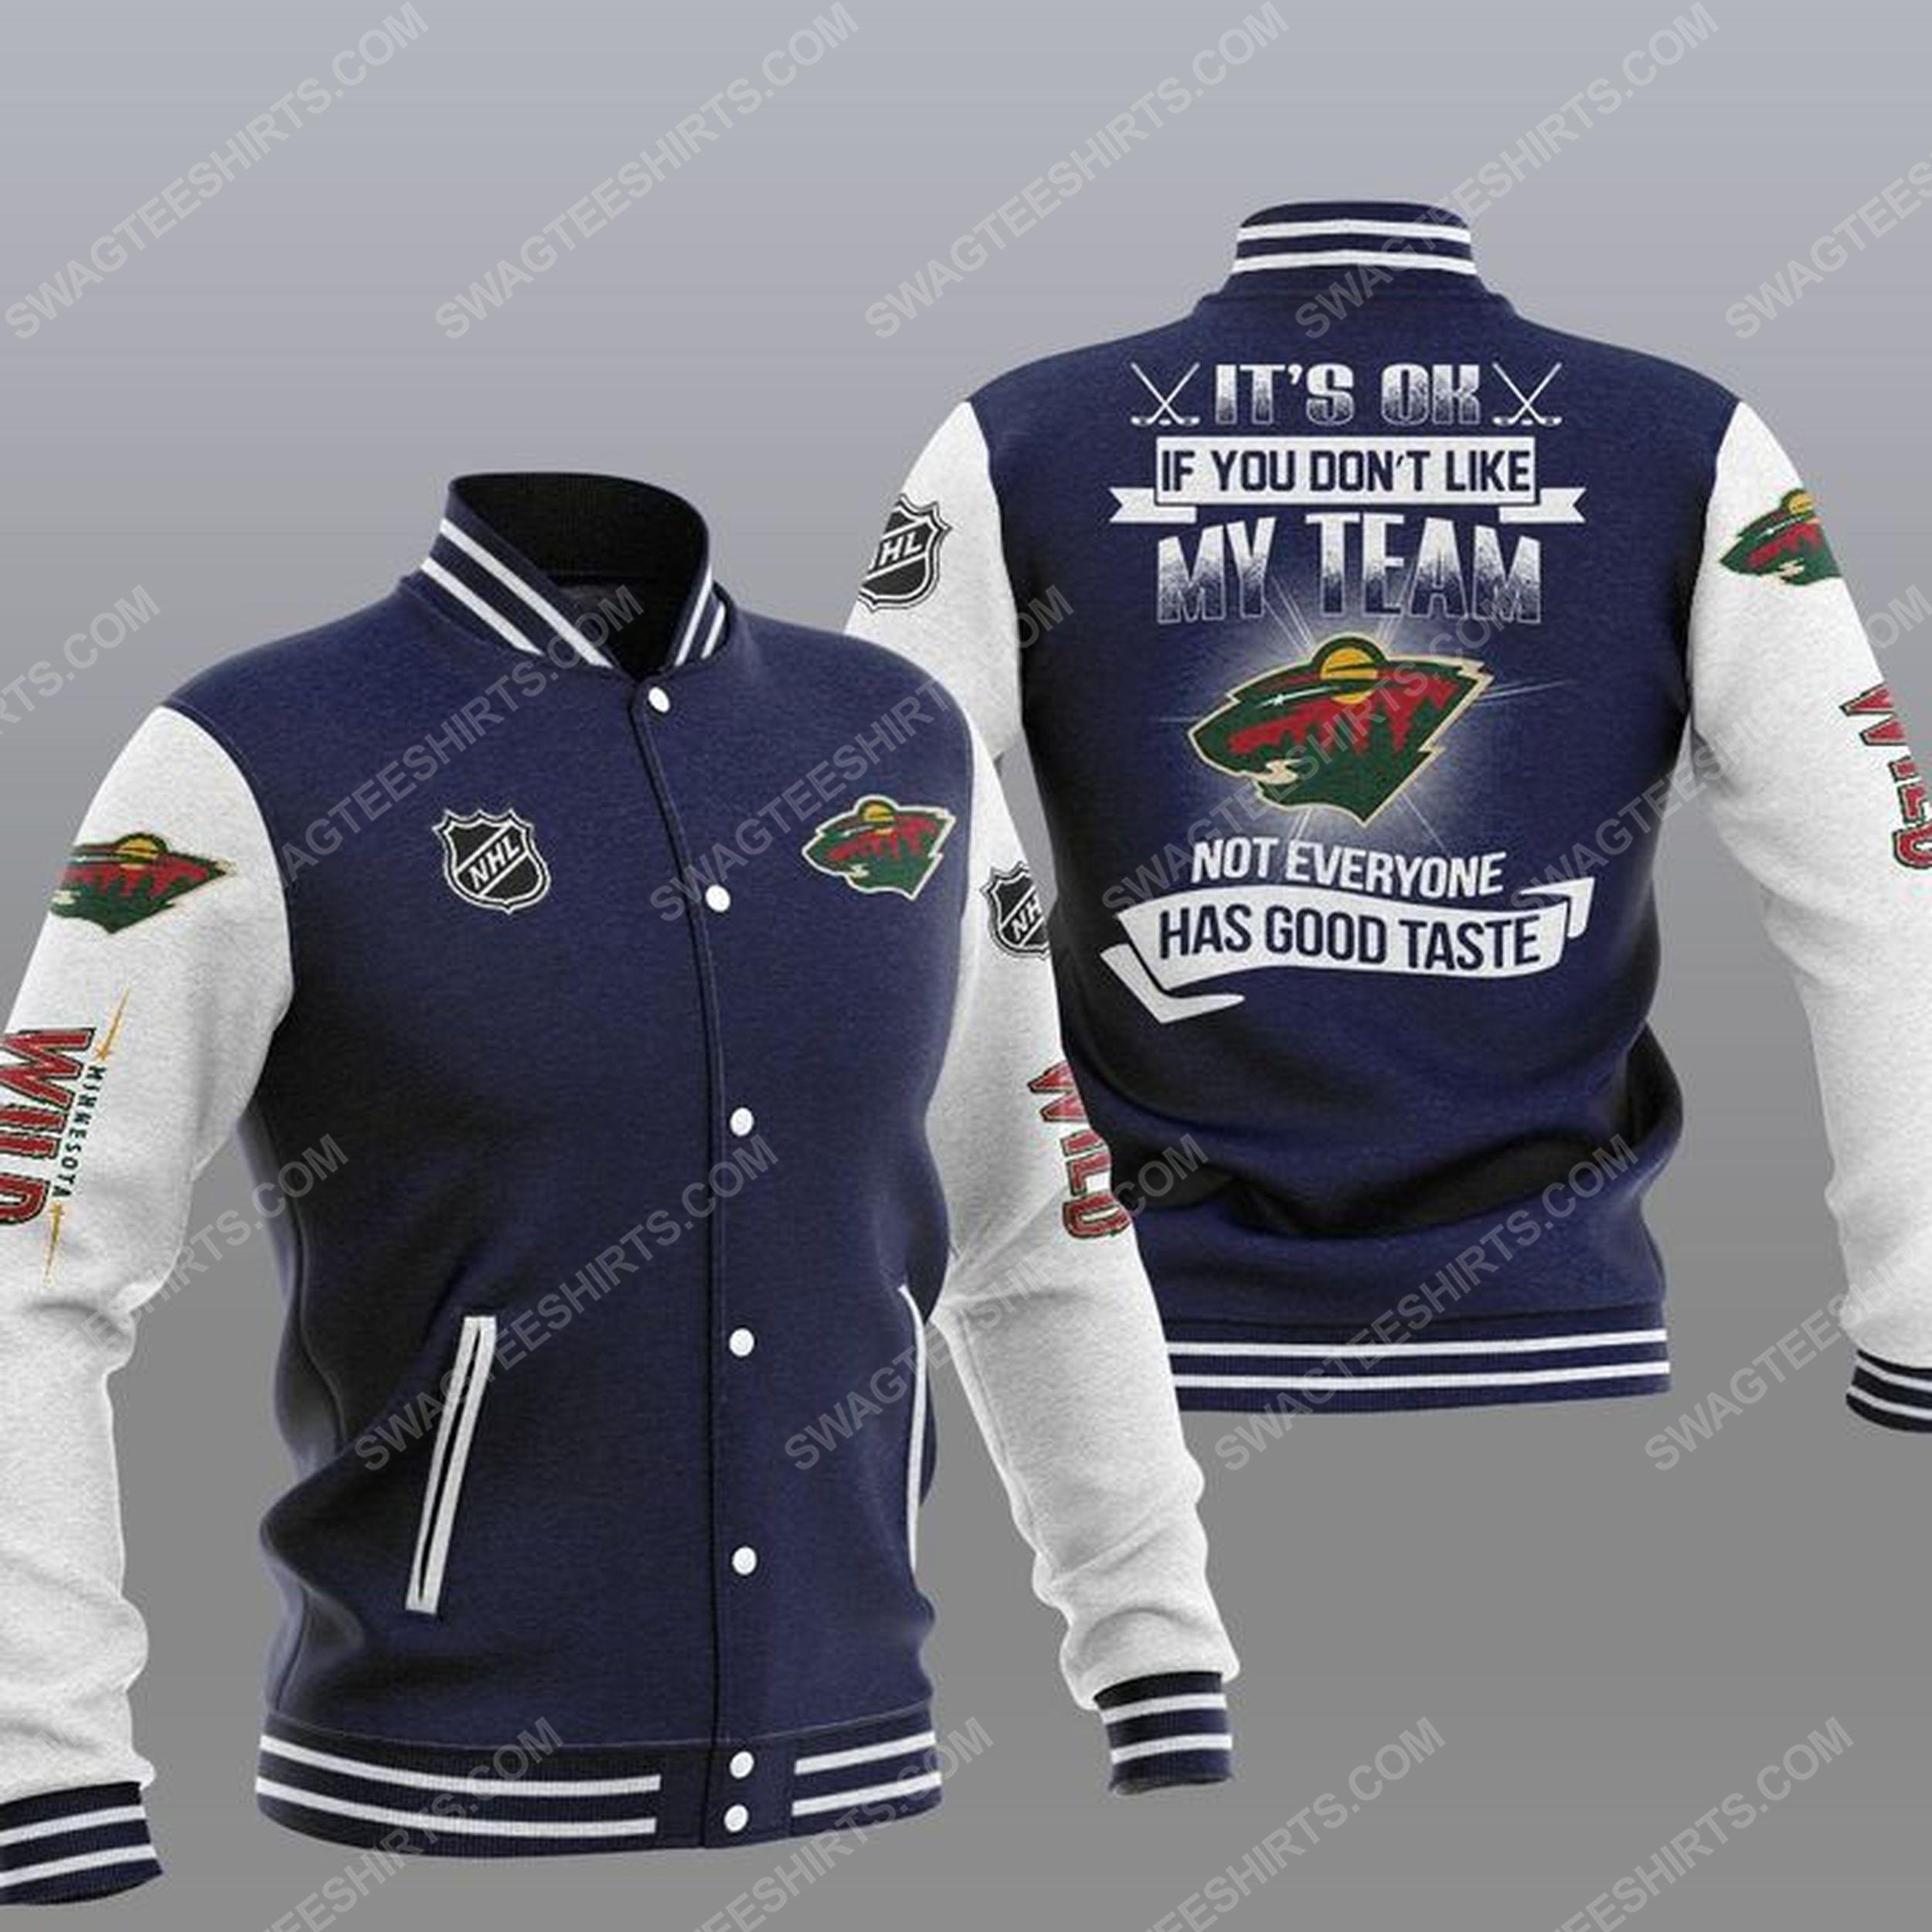 It's ok if you don't like my team minnesota wild all over print baseball jacket - navy 1